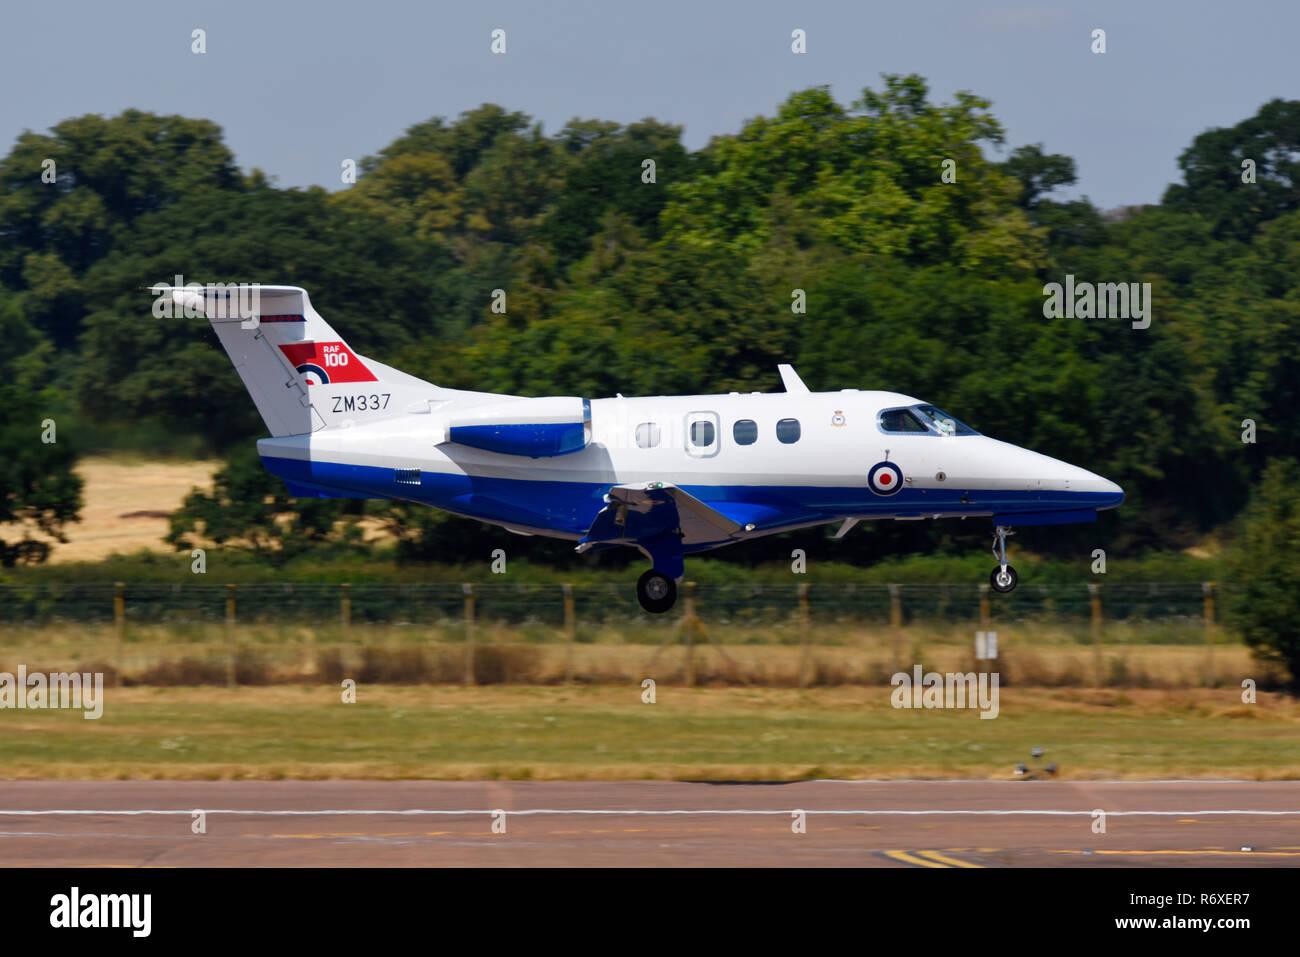 Embraer Phenom ZM 337 der Royal Air Force im Royal International Air Tattoo, RIAT, RAF Fairford Airshow. Durch Affinität Flying Training Services Ltd. Stockbild